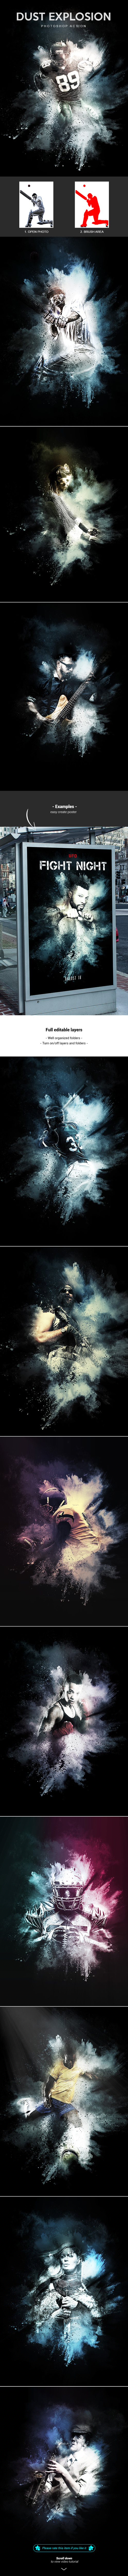 Dust Explosion - Photoshop Action